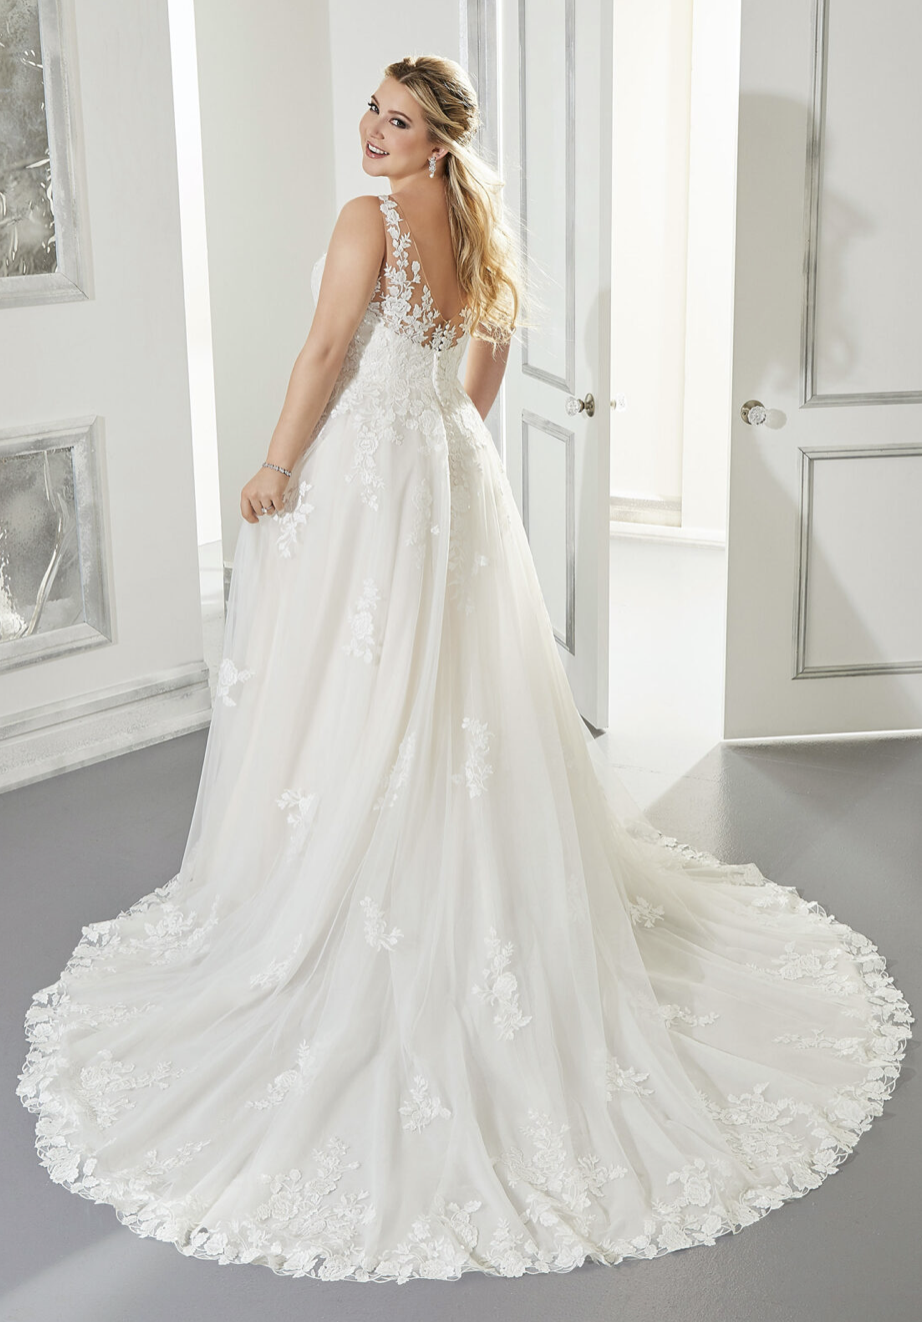 Arlene Wedding Dress 3302